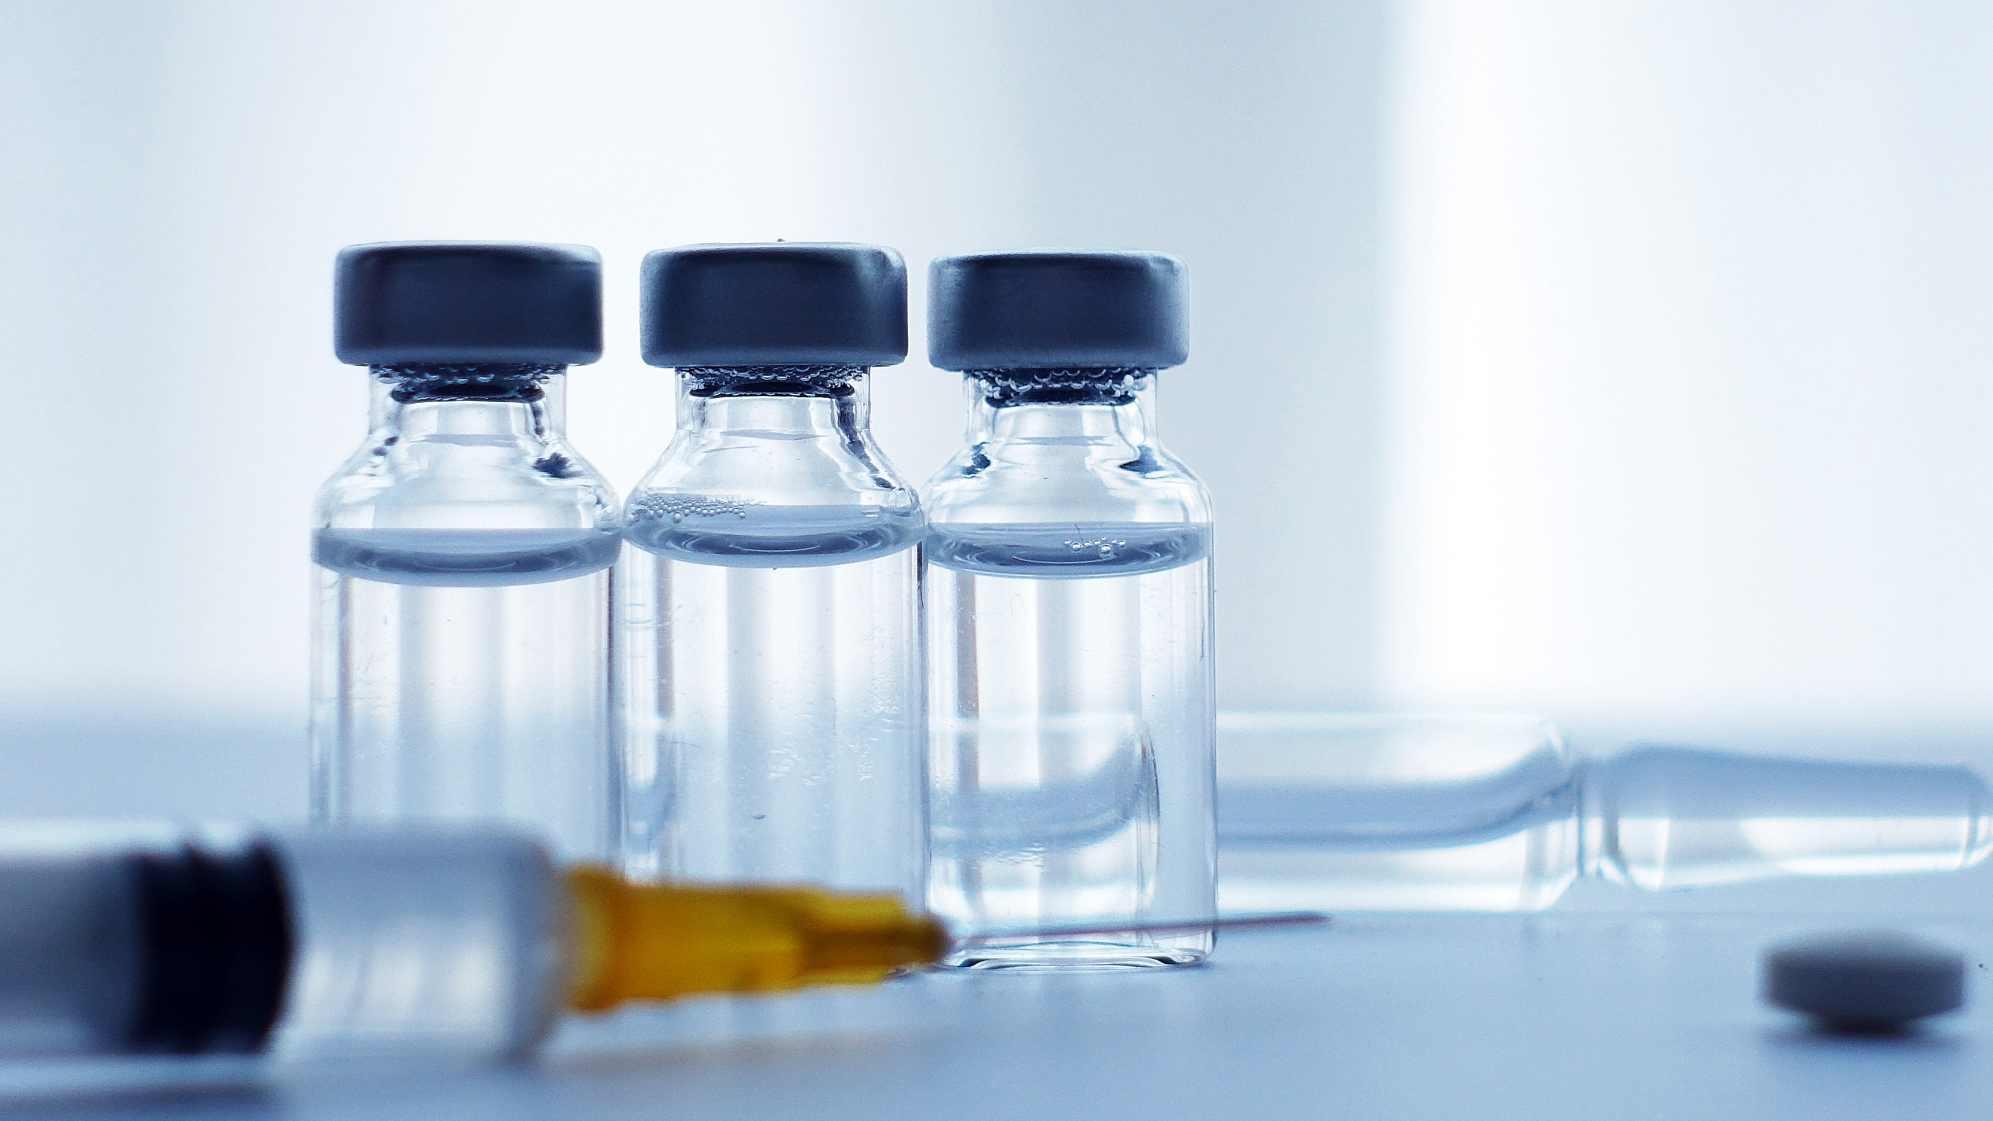 Canada, China cooperate to develop COVID-19 vaccine: Report